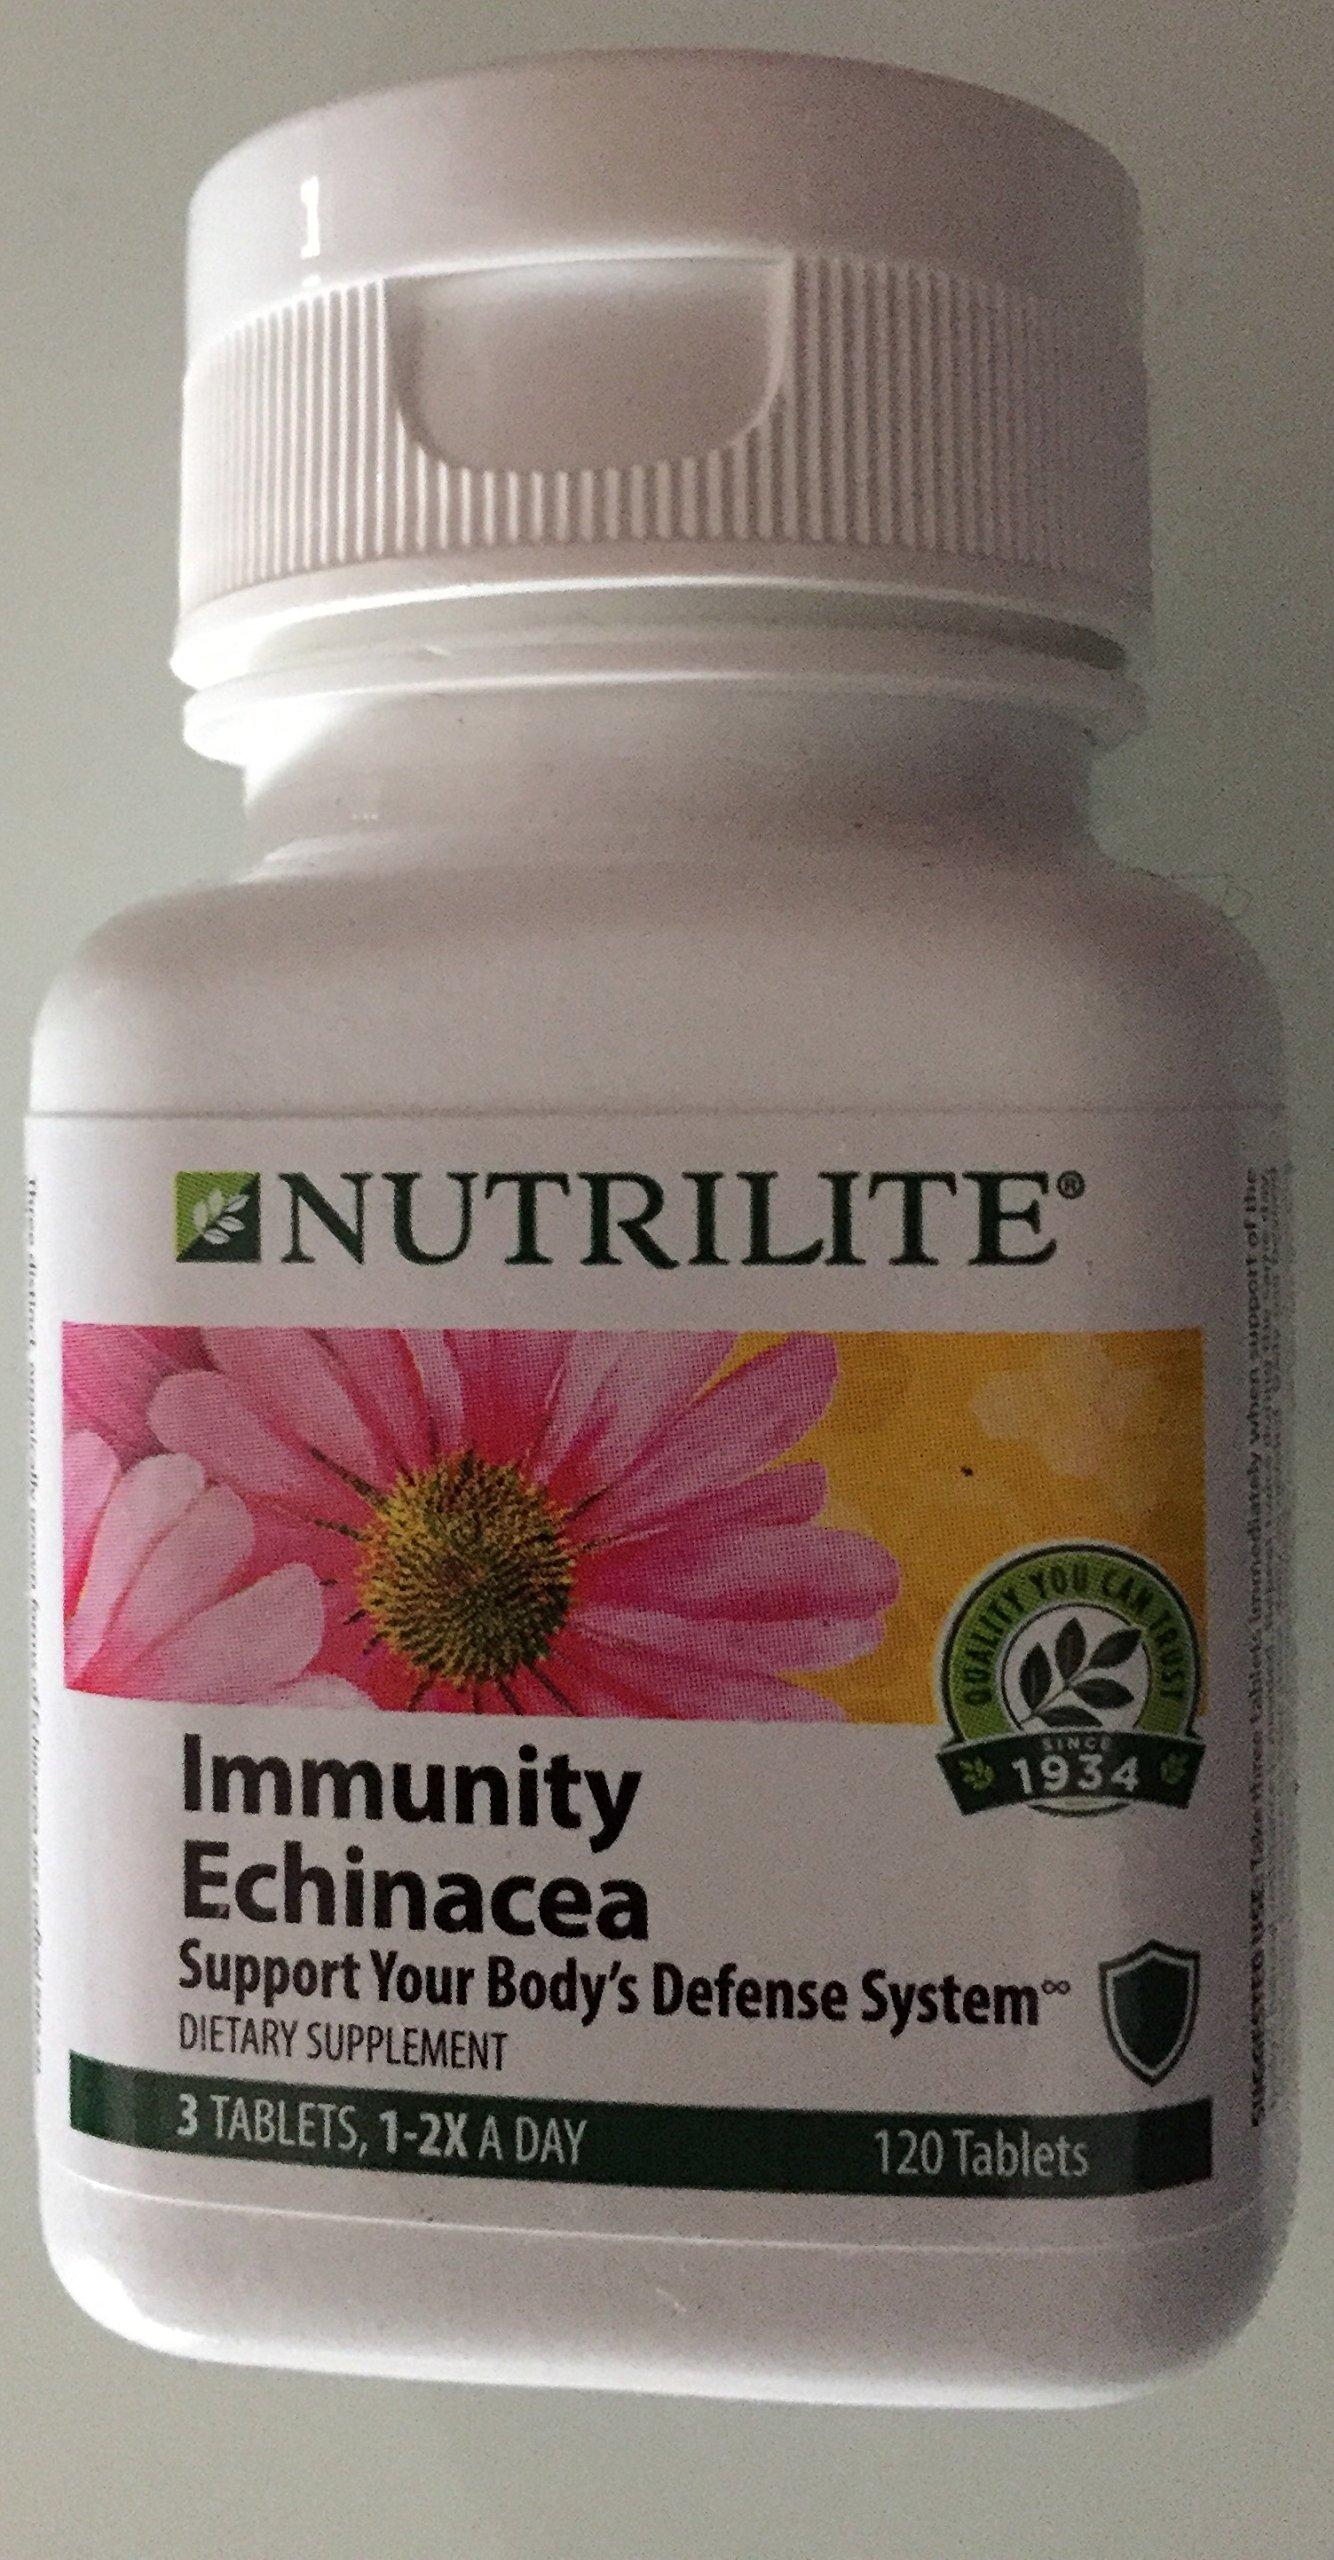 Nutrilite Immunity Echinacea - Tablets 120 Count